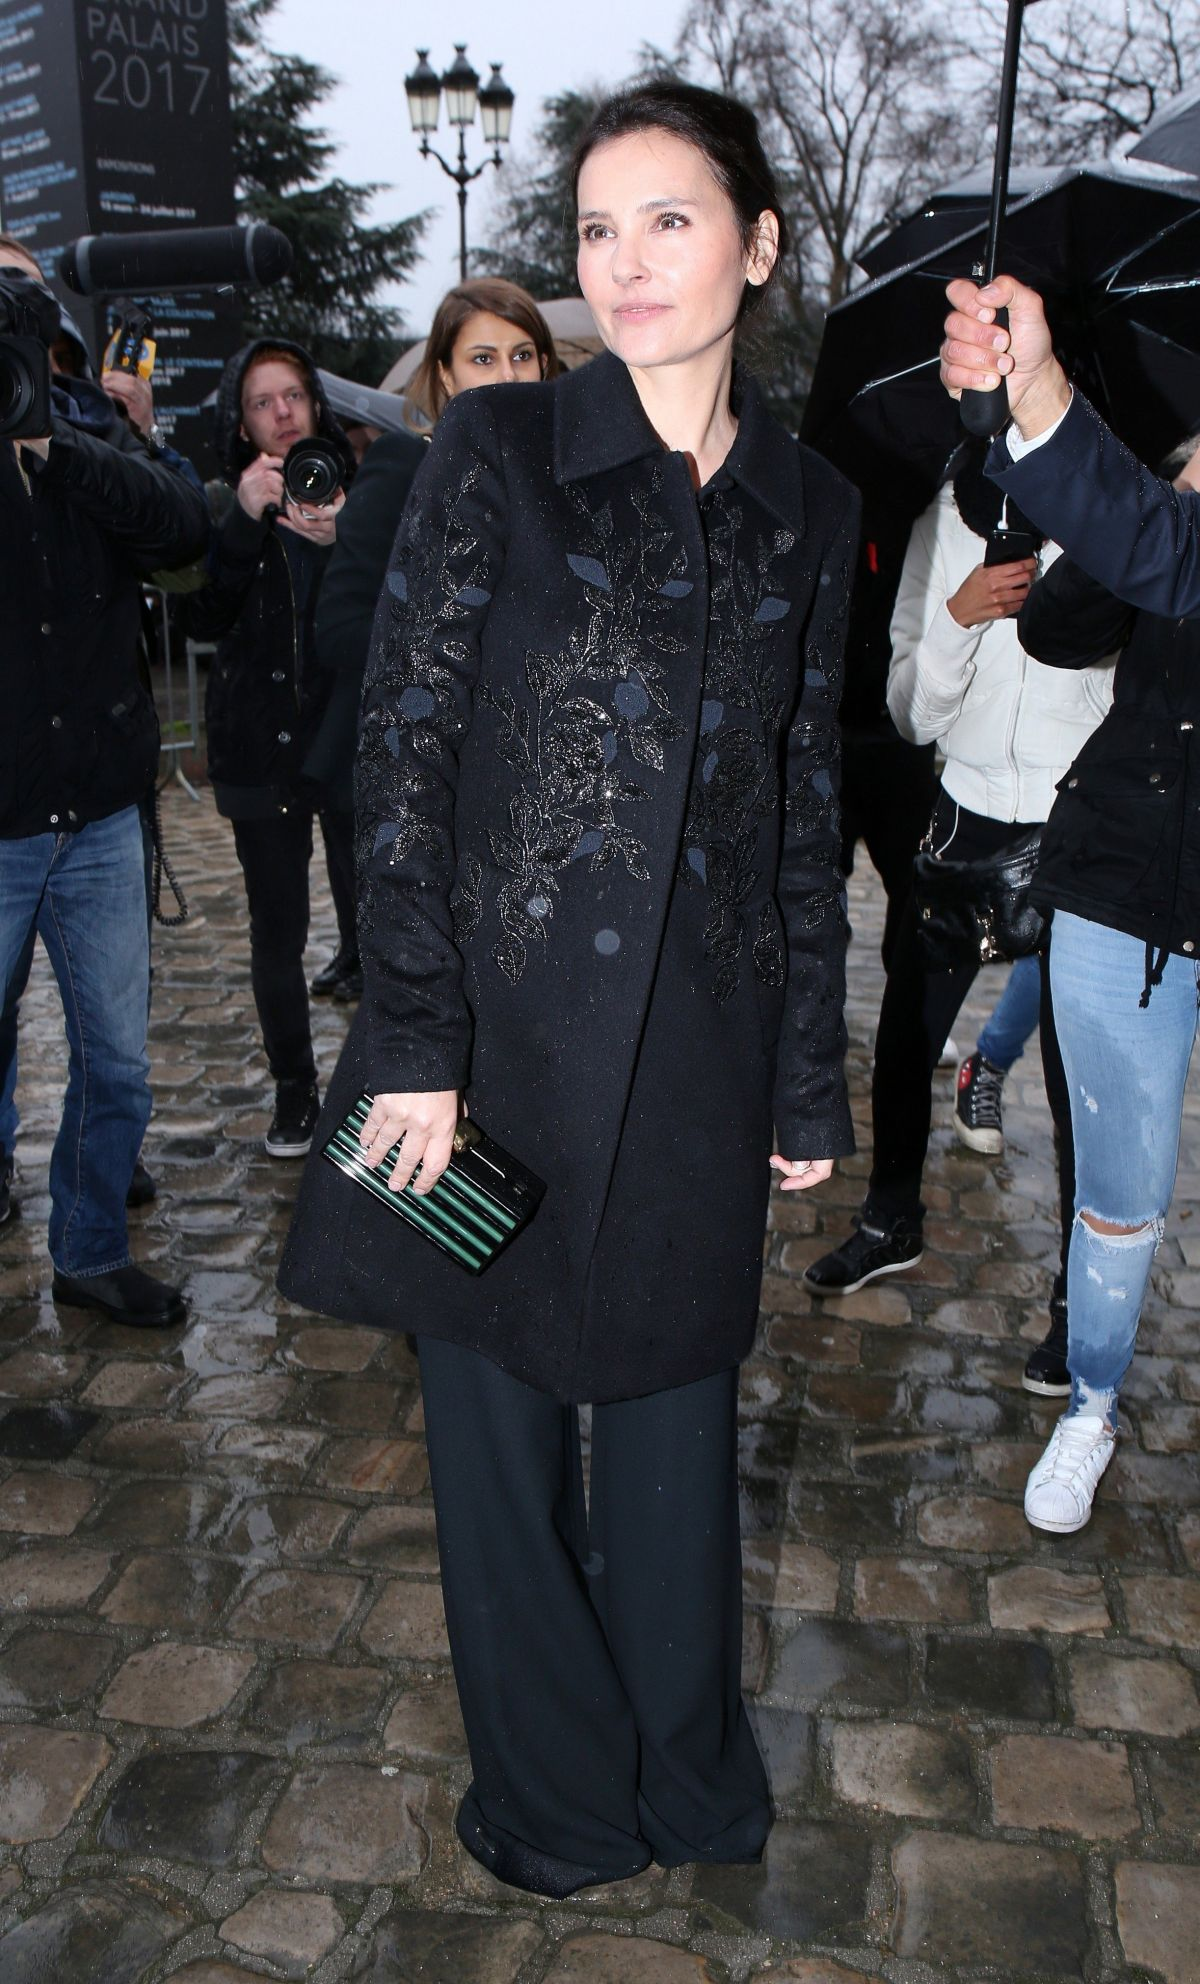 VIRGINE LEDOYEN Arrives at Elie Saab Fashion Show in Paris 03/04/2017